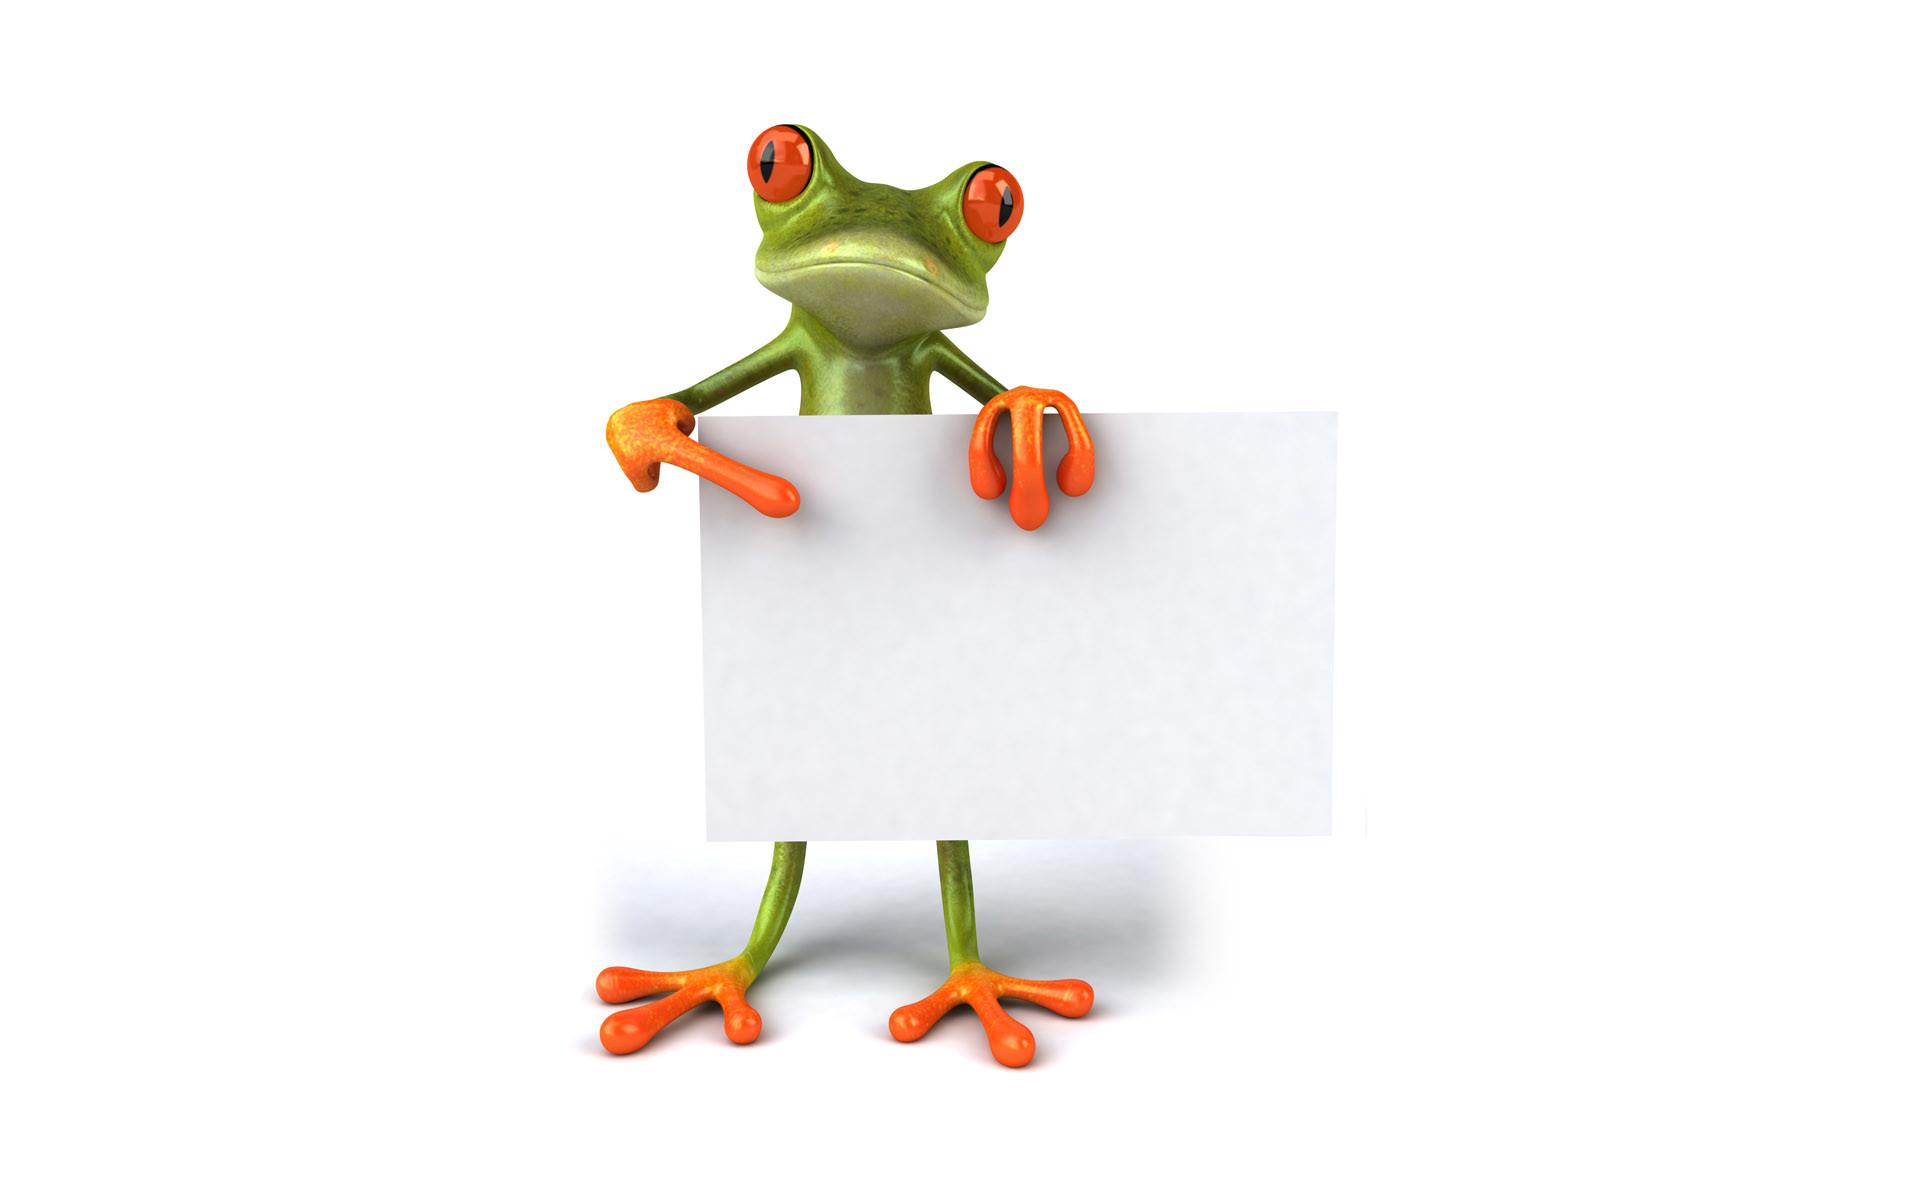 D Cute Frog Wallpaper WallpaperPlay 1920×1200 Frog Wallpaper (58 Wallpapers)  | Adorable